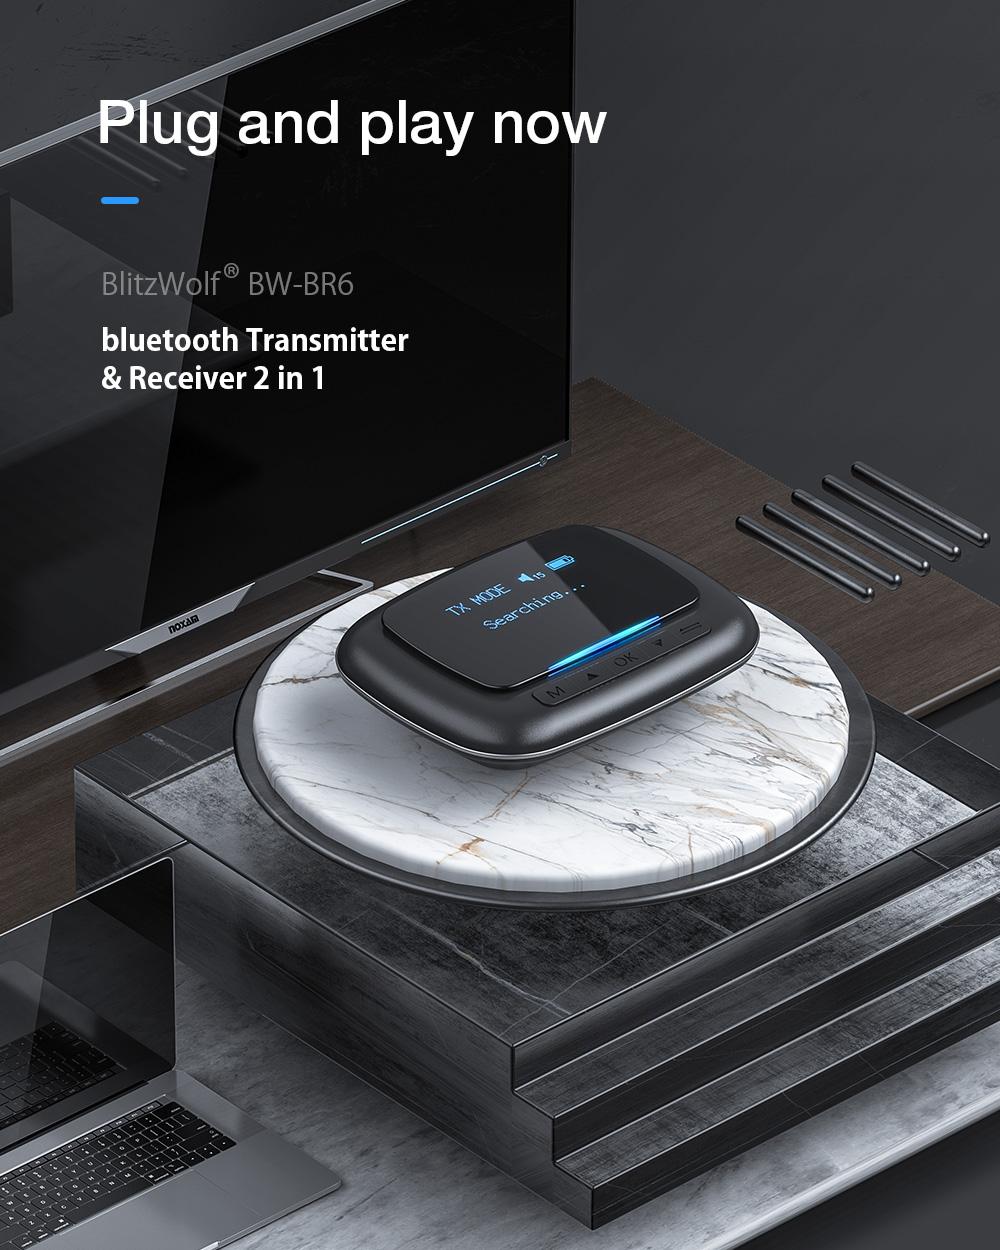 Blitzwolf BW-BR6 Bluetooth transmitter